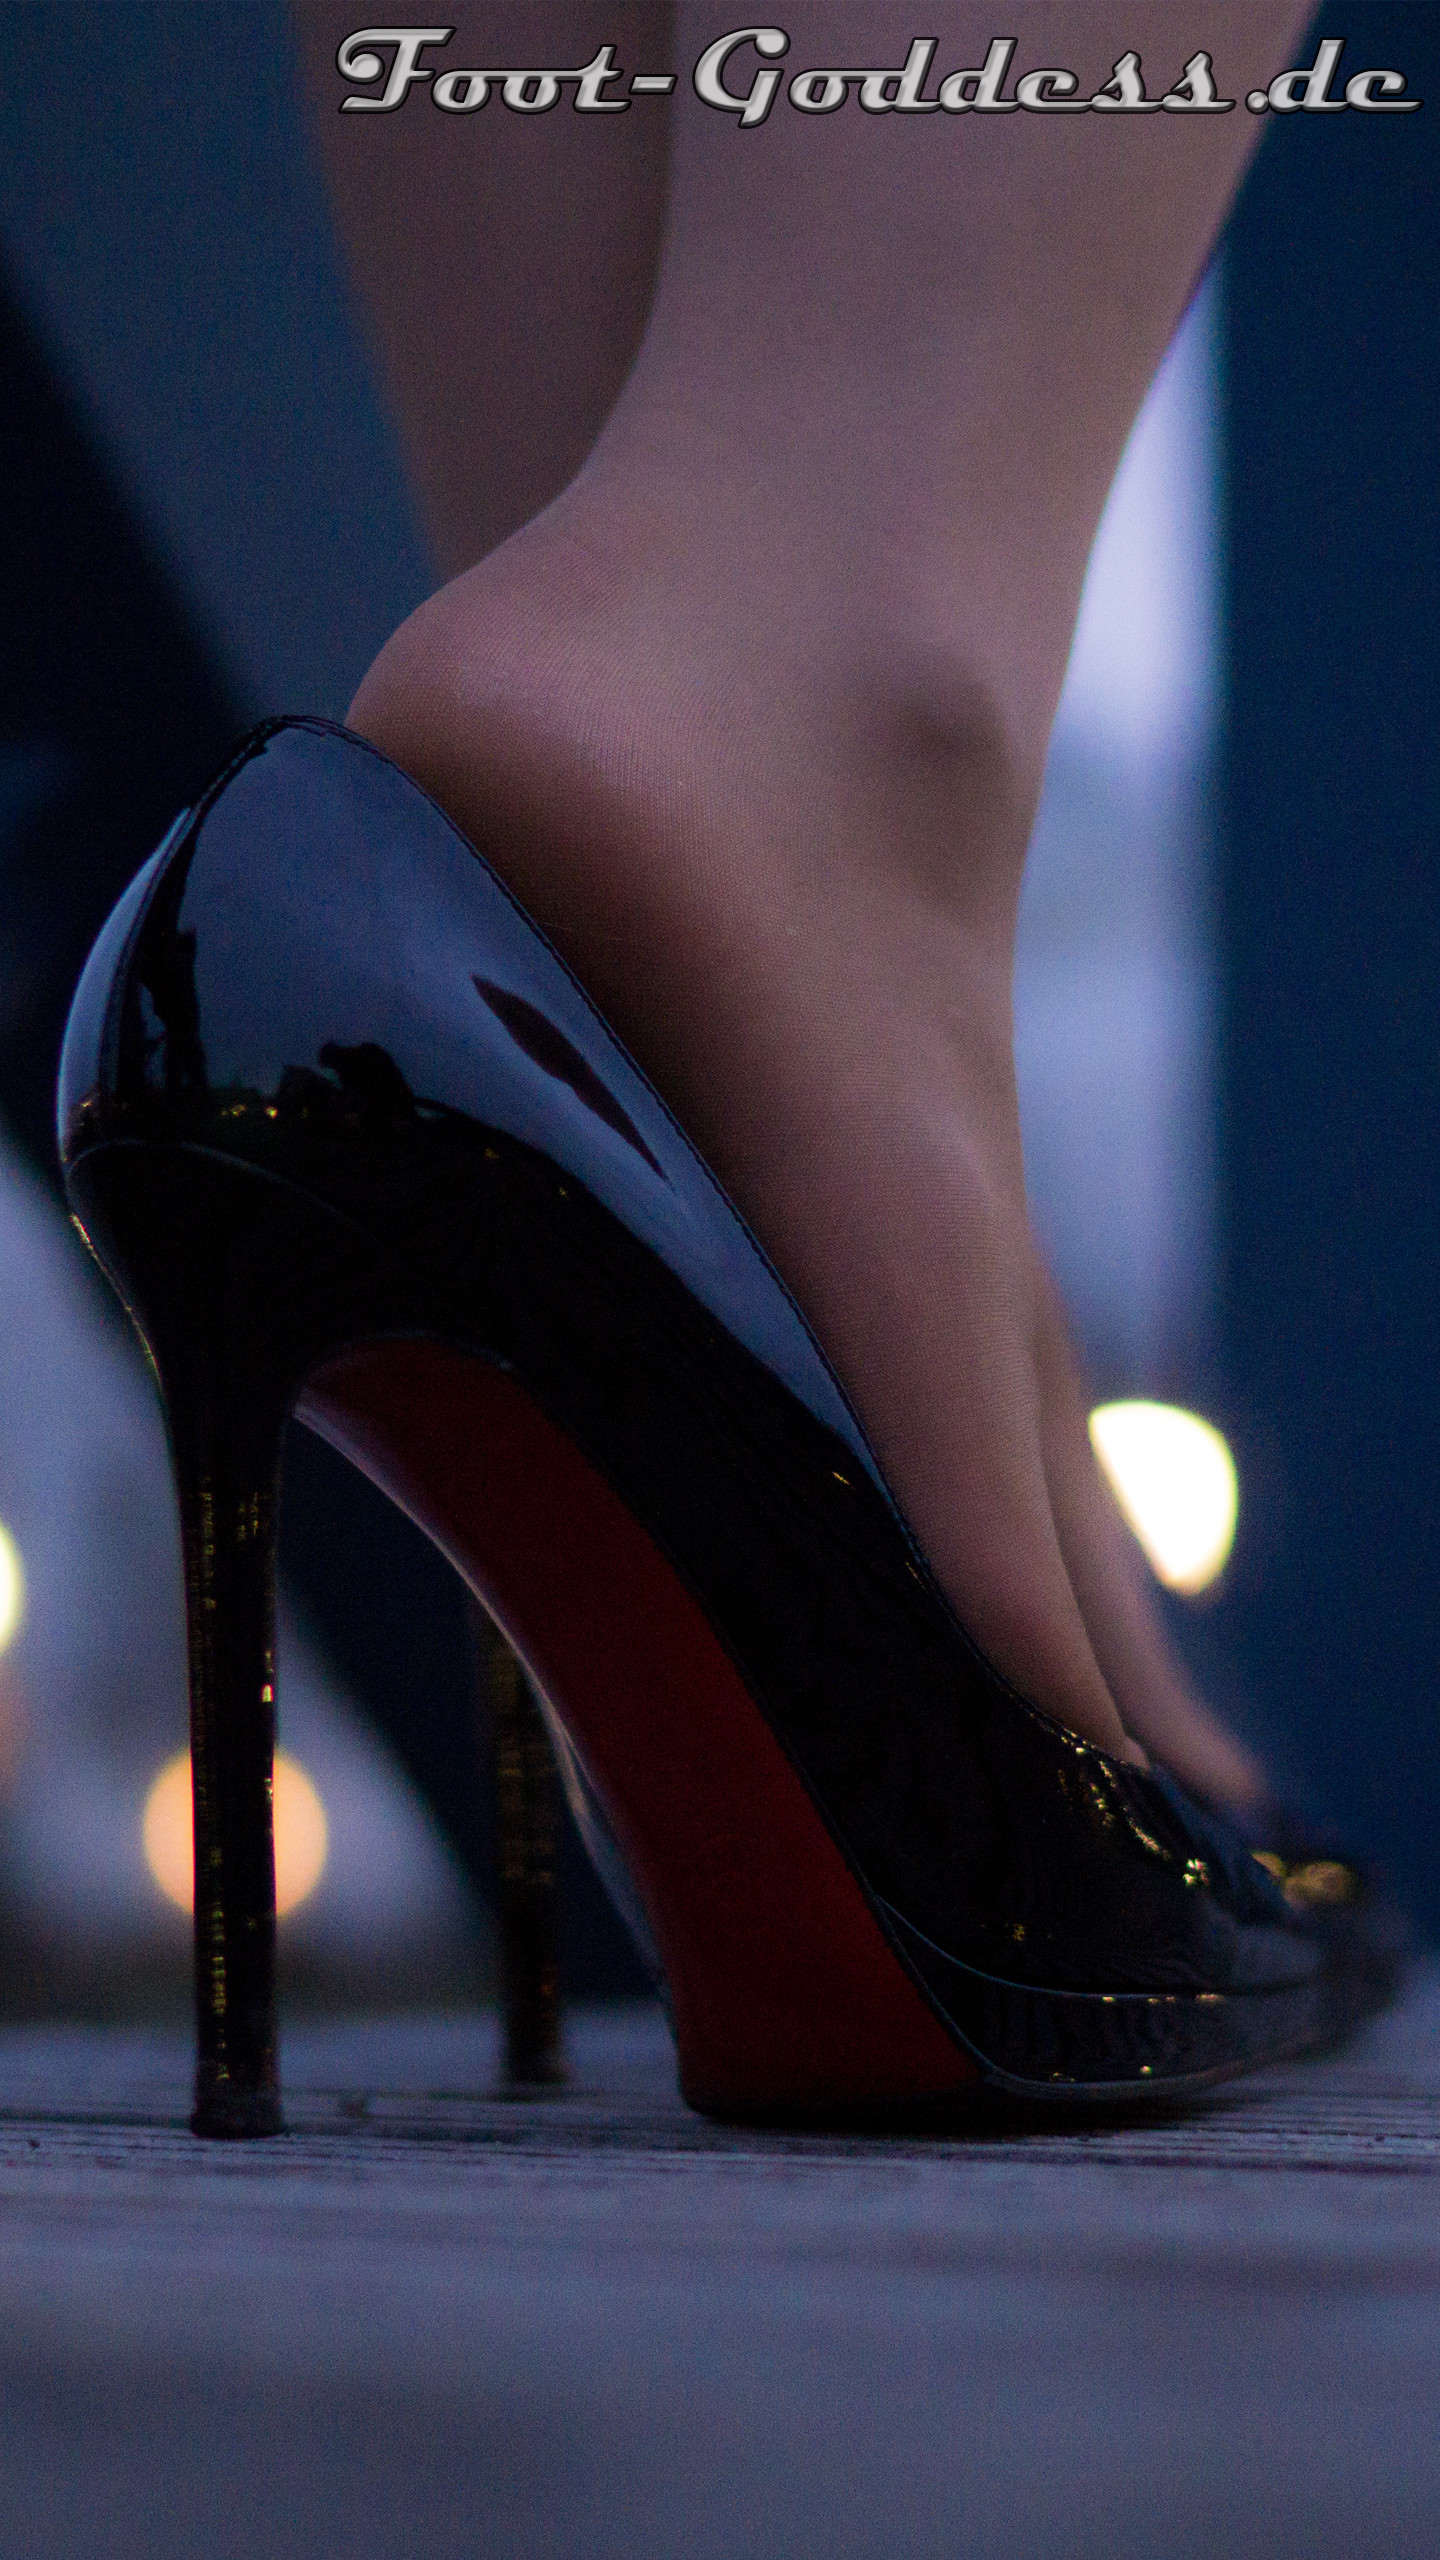 foot-goddess-1-5